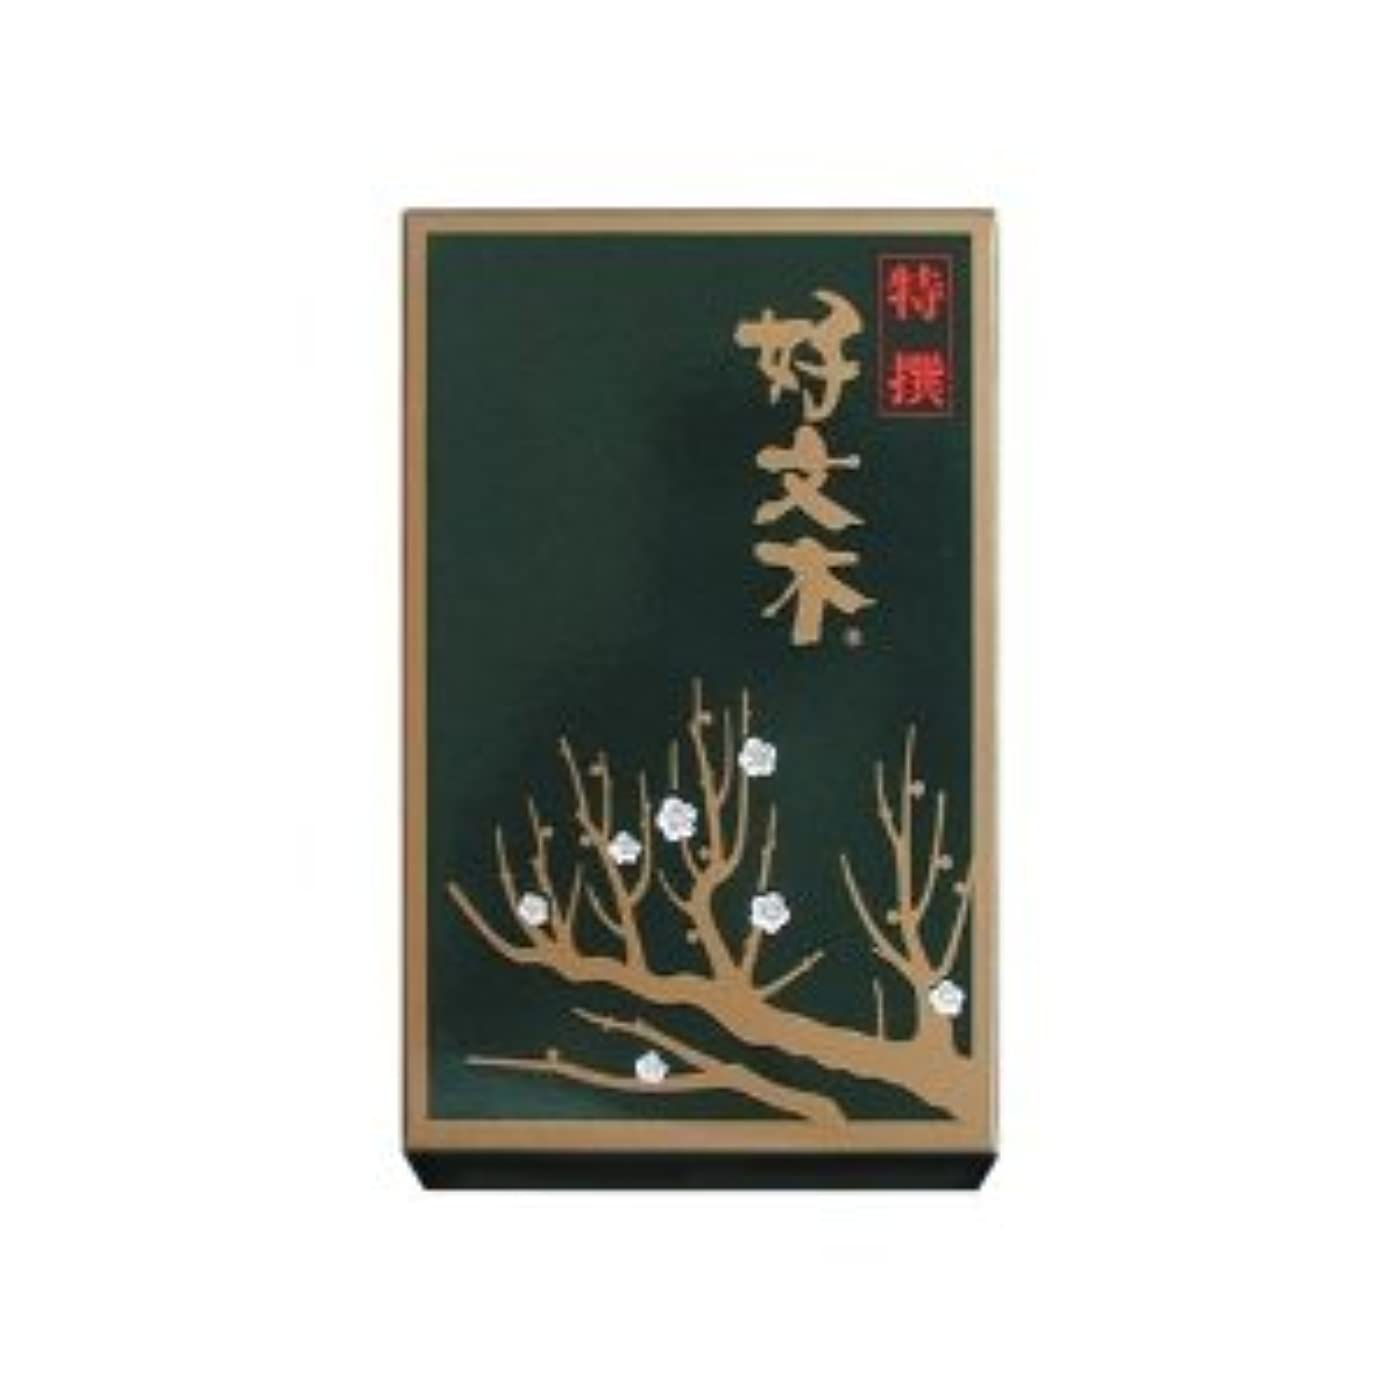 木曜日ジャンク孤独梅栄堂 特撰好文木 短寸大型バラ詰